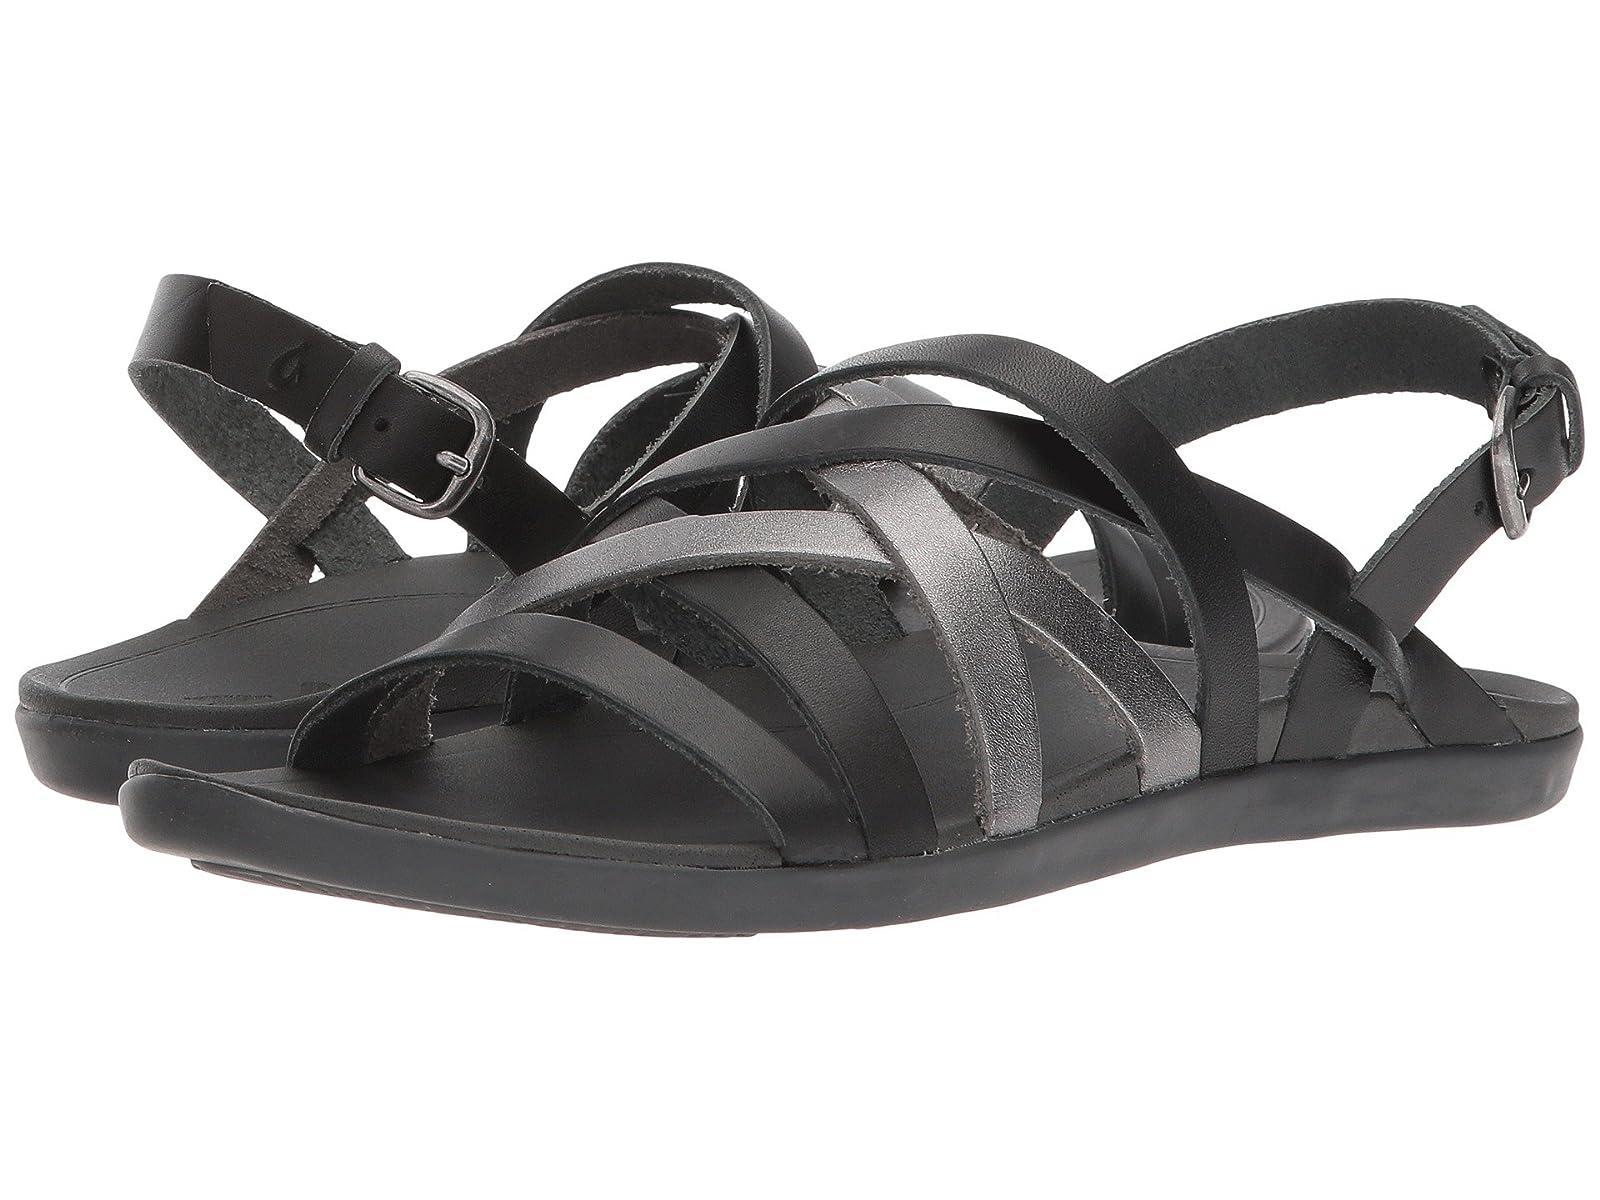 OluKai 'Awe'AweAtmospheric grades have affordable shoes